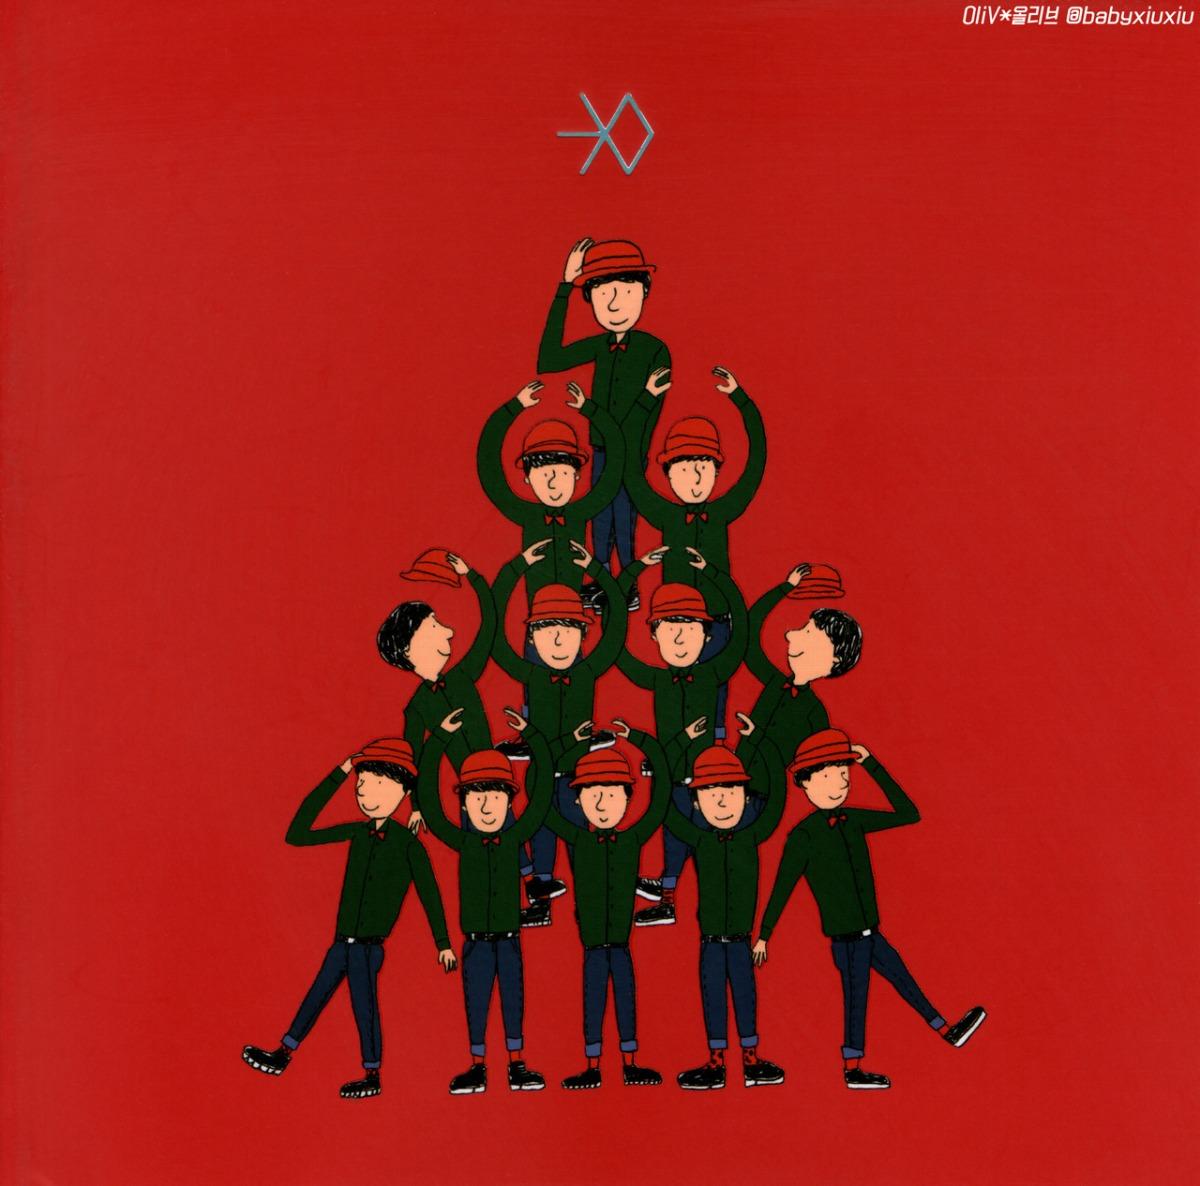 miracles in december album rar